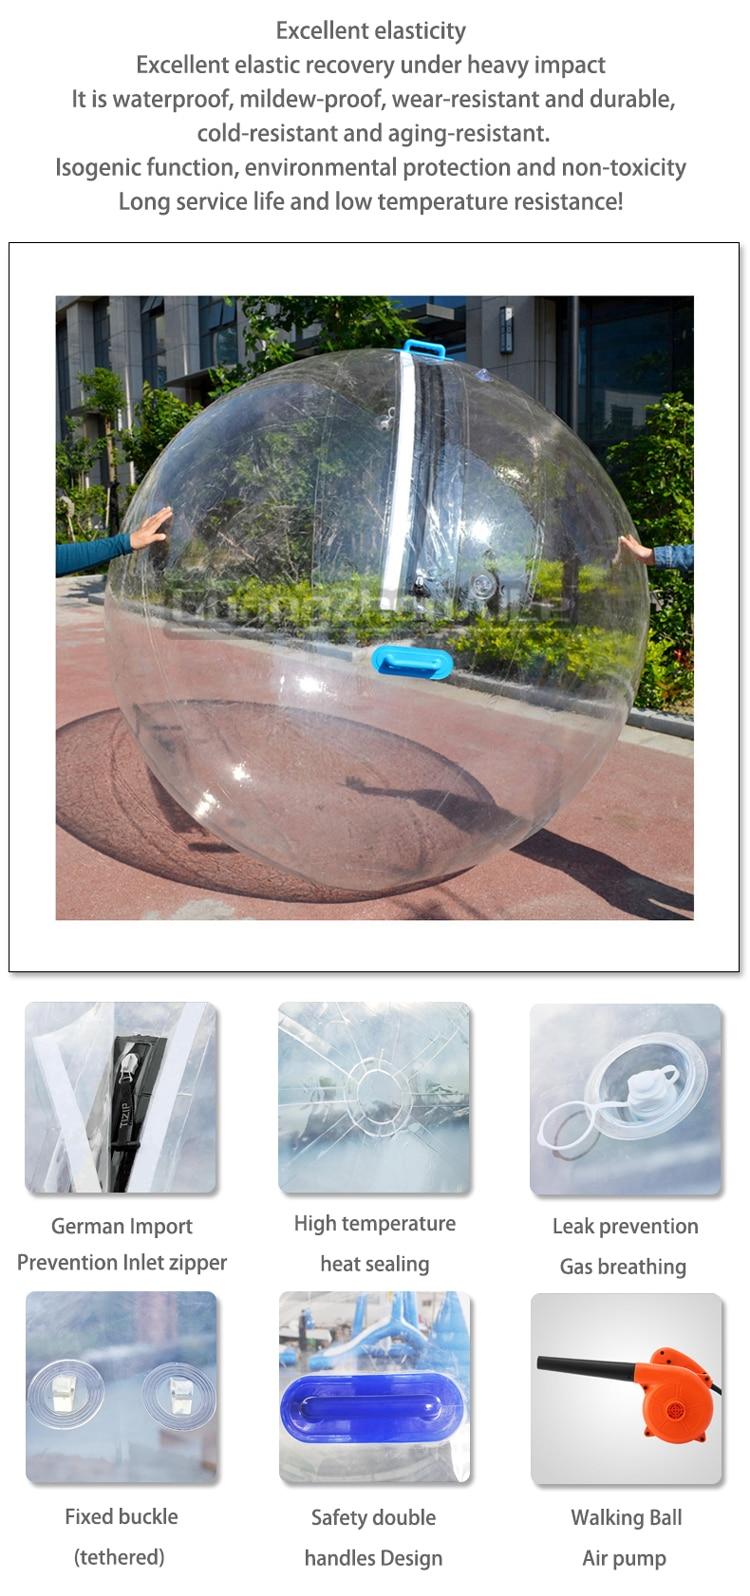 O Envio gratuito de 1.0 milímetros Tpu 2.0m Moda Waterballs Design